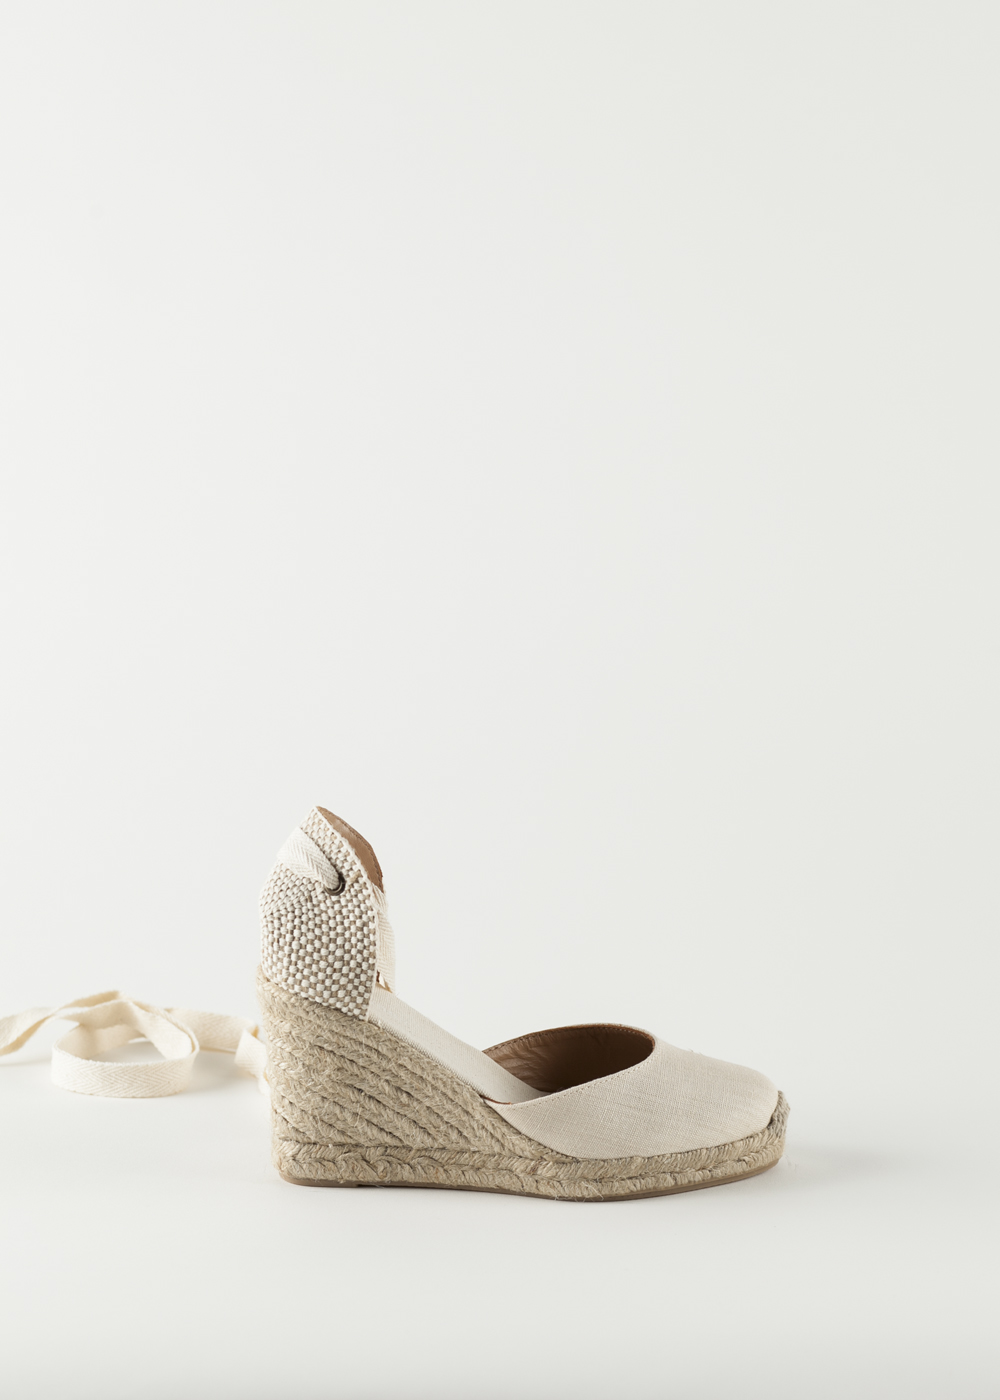 soludos wedge linen shoe blush garmentory